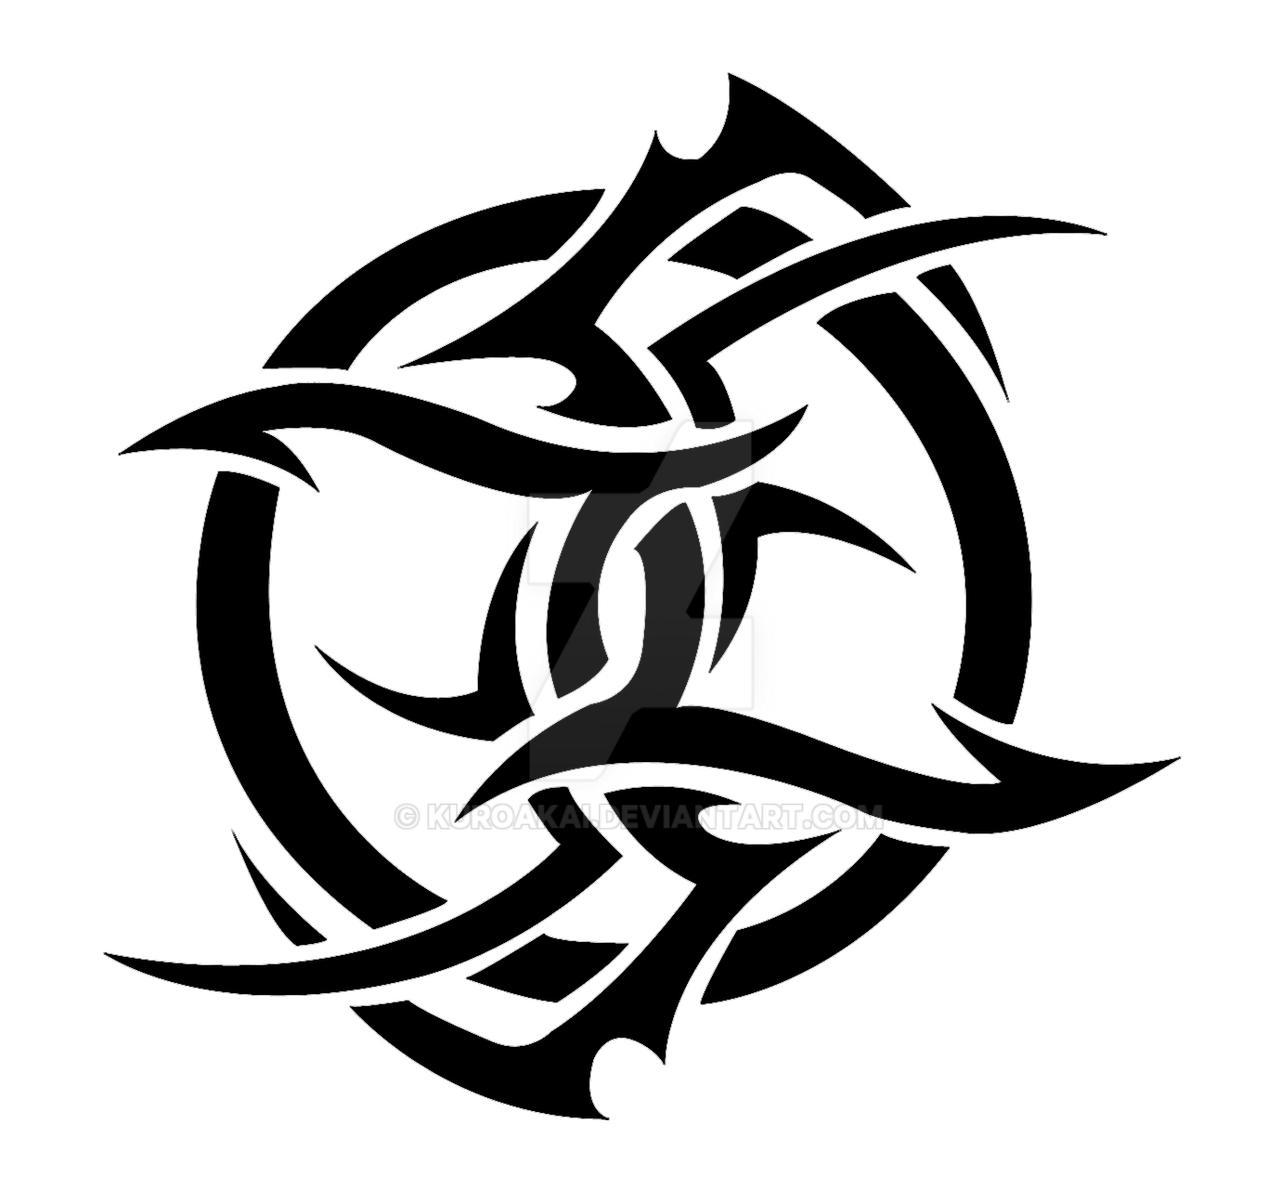 Tribal Gemini Tattoos For Guys: Gemini Tribal By Kuroakai On DeviantArt